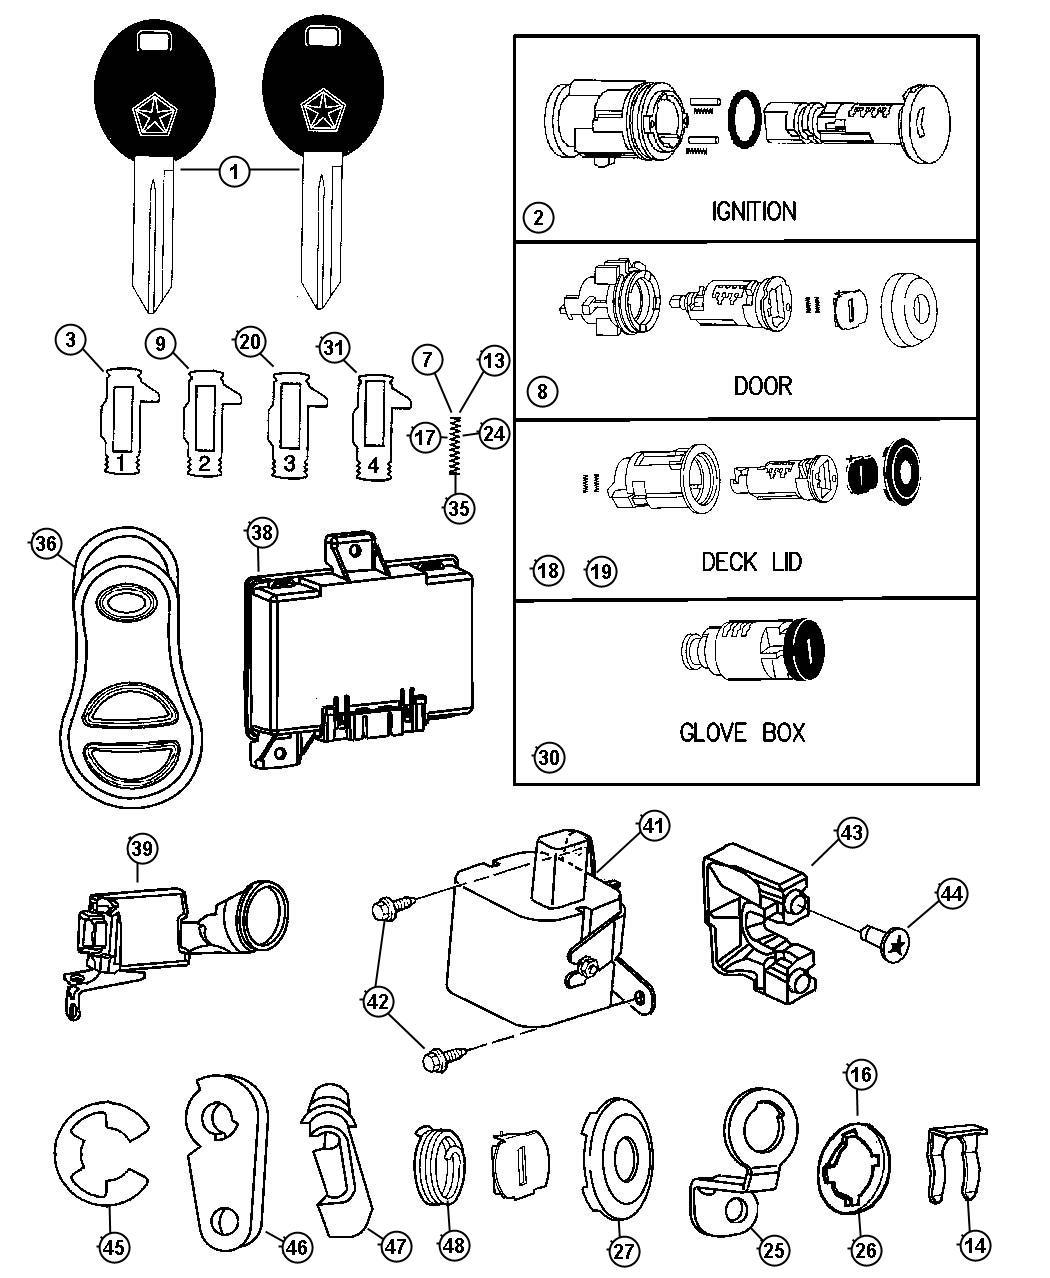 Chrysler Pt Cruiser Clip Latch Rh Locking Key Fuel